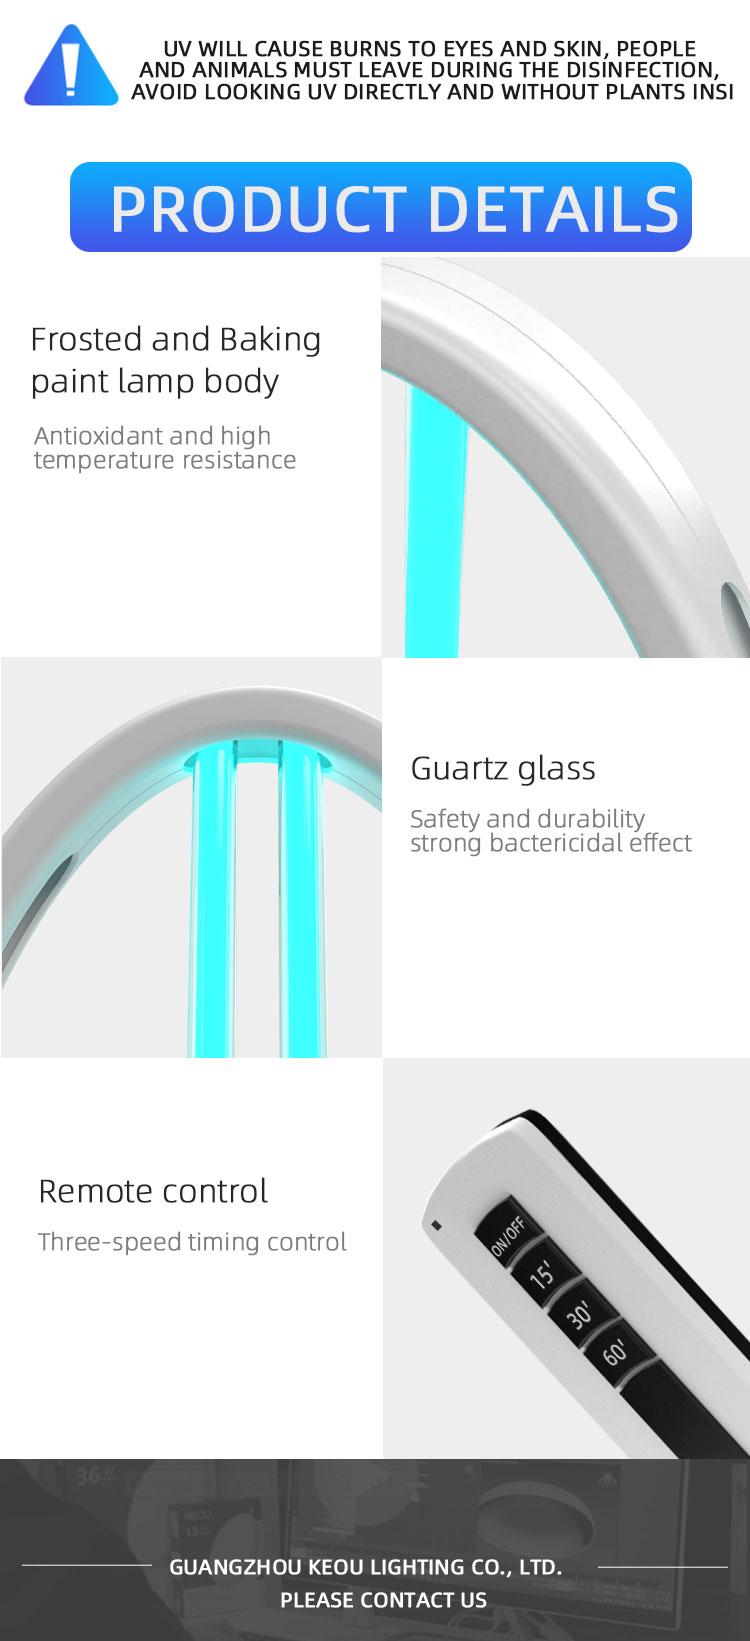 UV Germicidal light